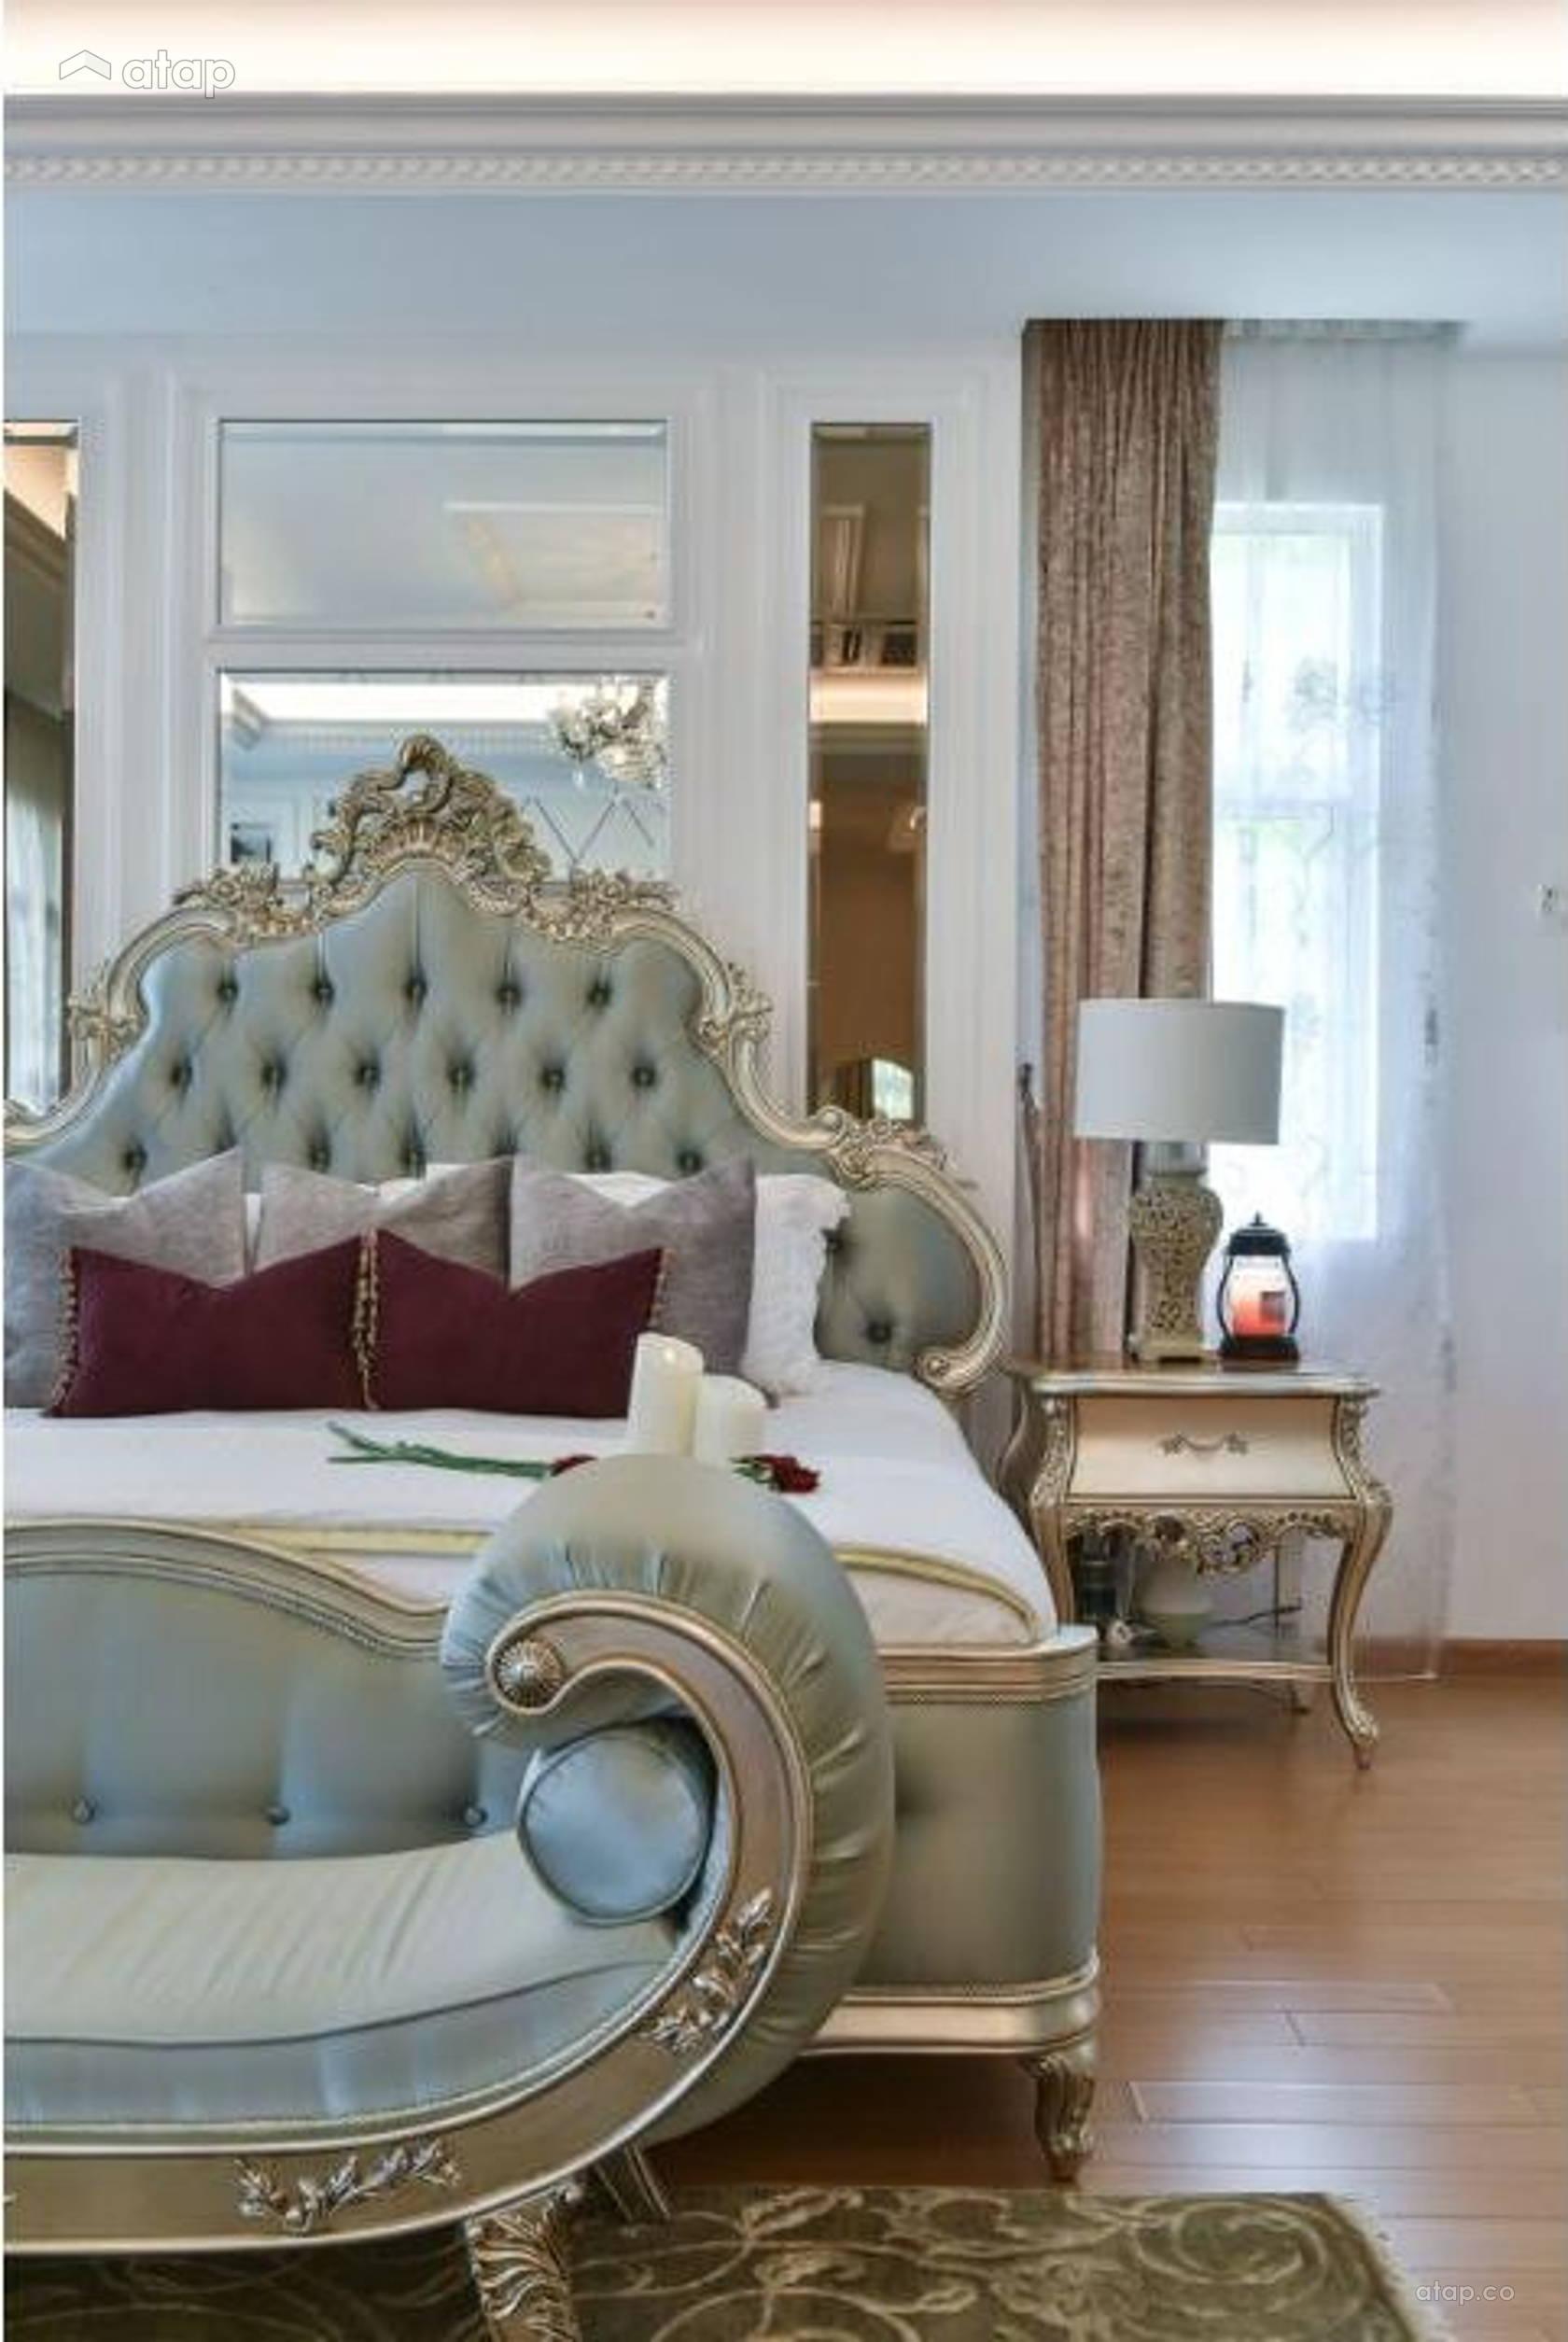 latitude design interior design services petaling jaya selangor budget rm 200 000